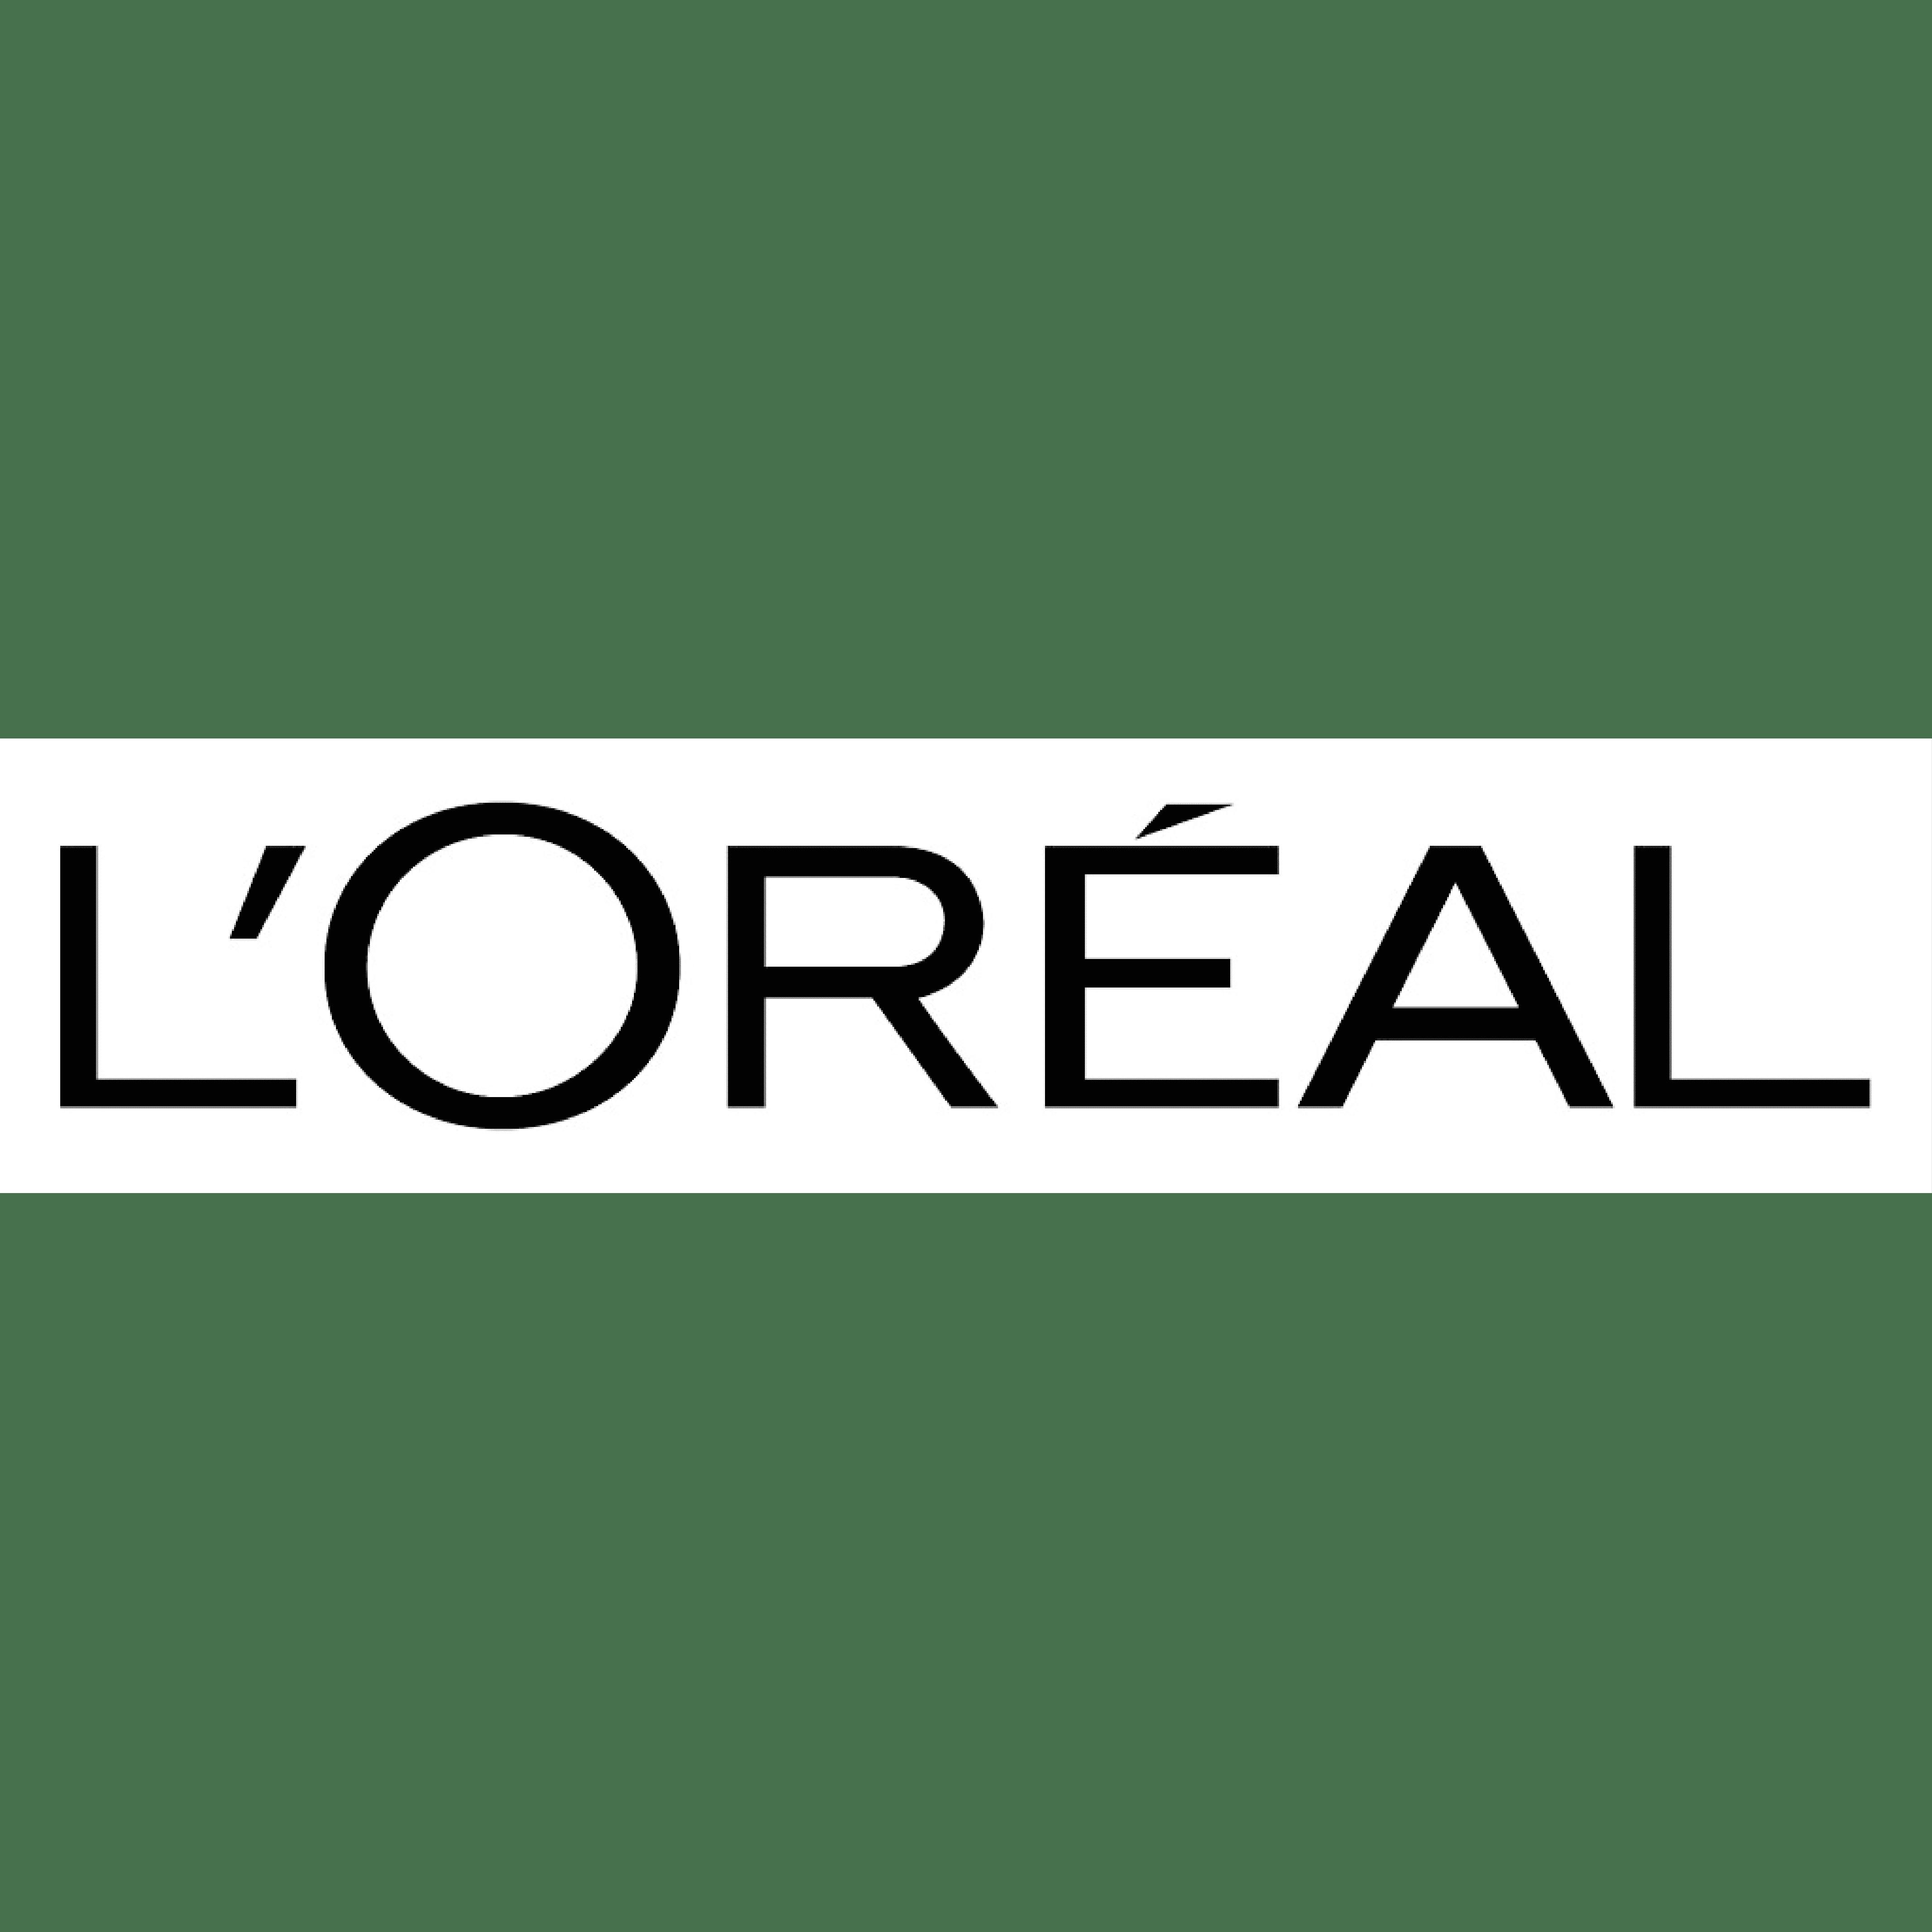 loreal-partner_Plan de travail 1